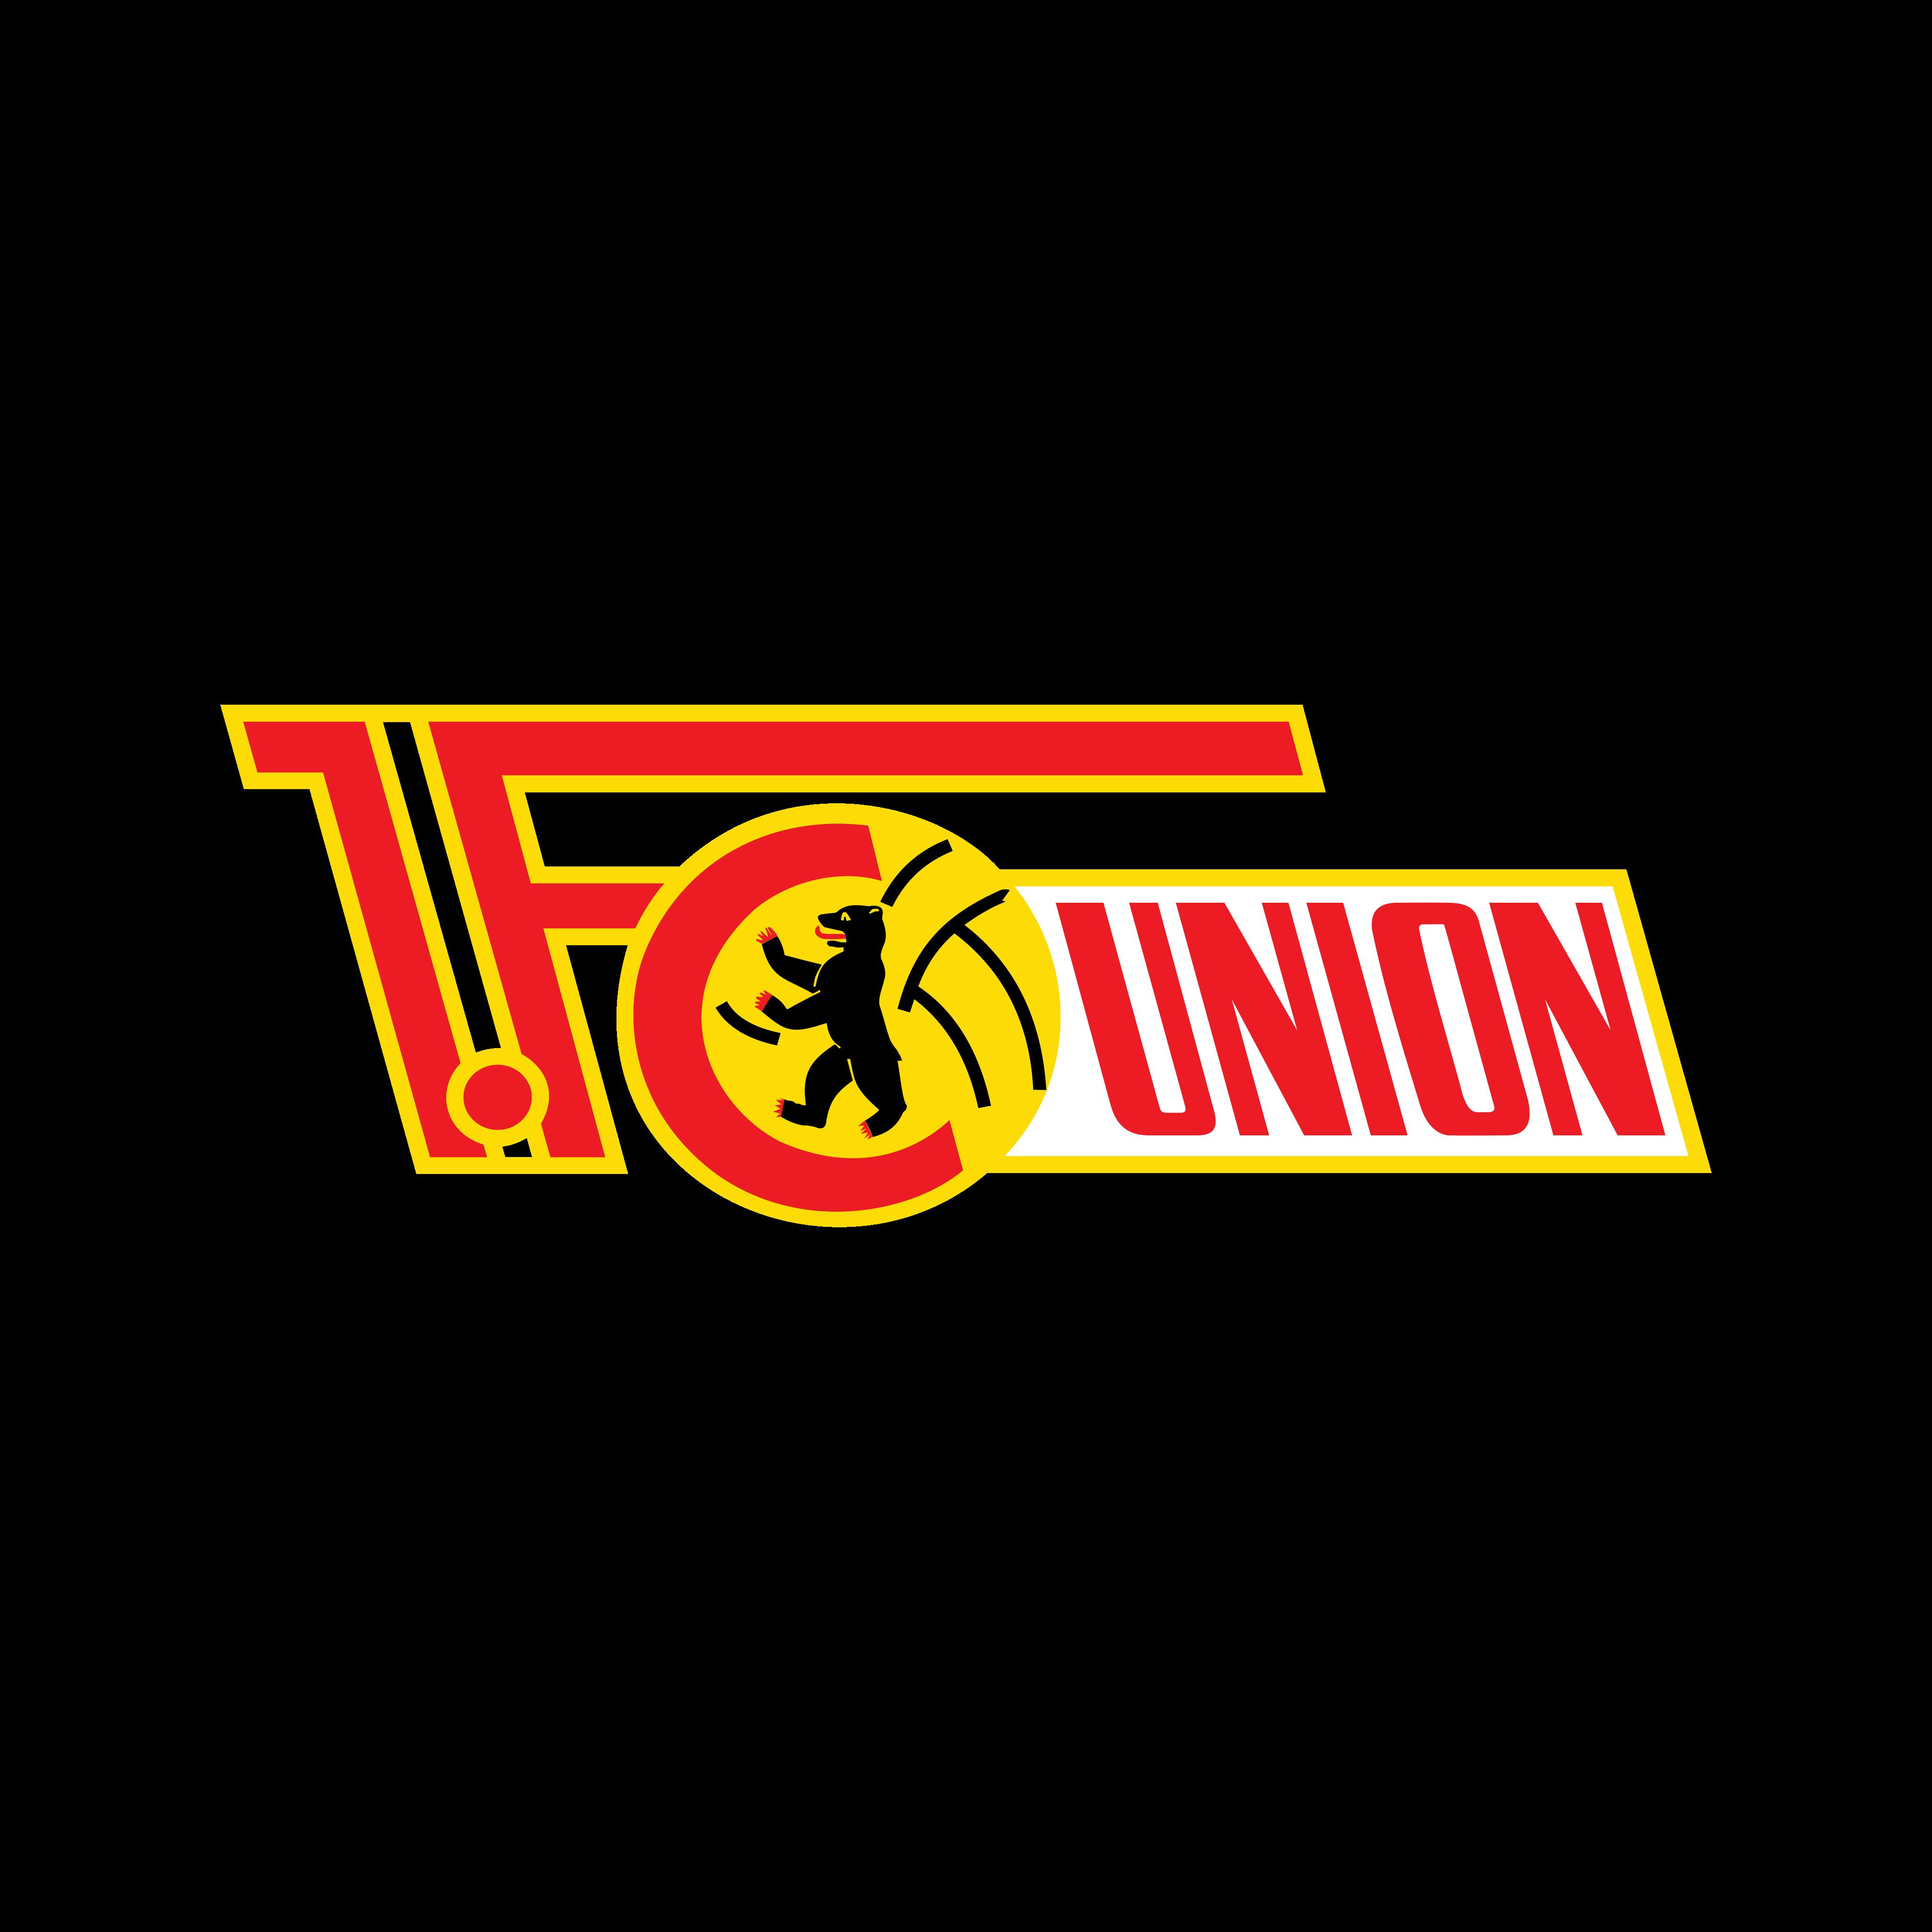 fc union berlin logo 0 - FC Union Berlin Logo